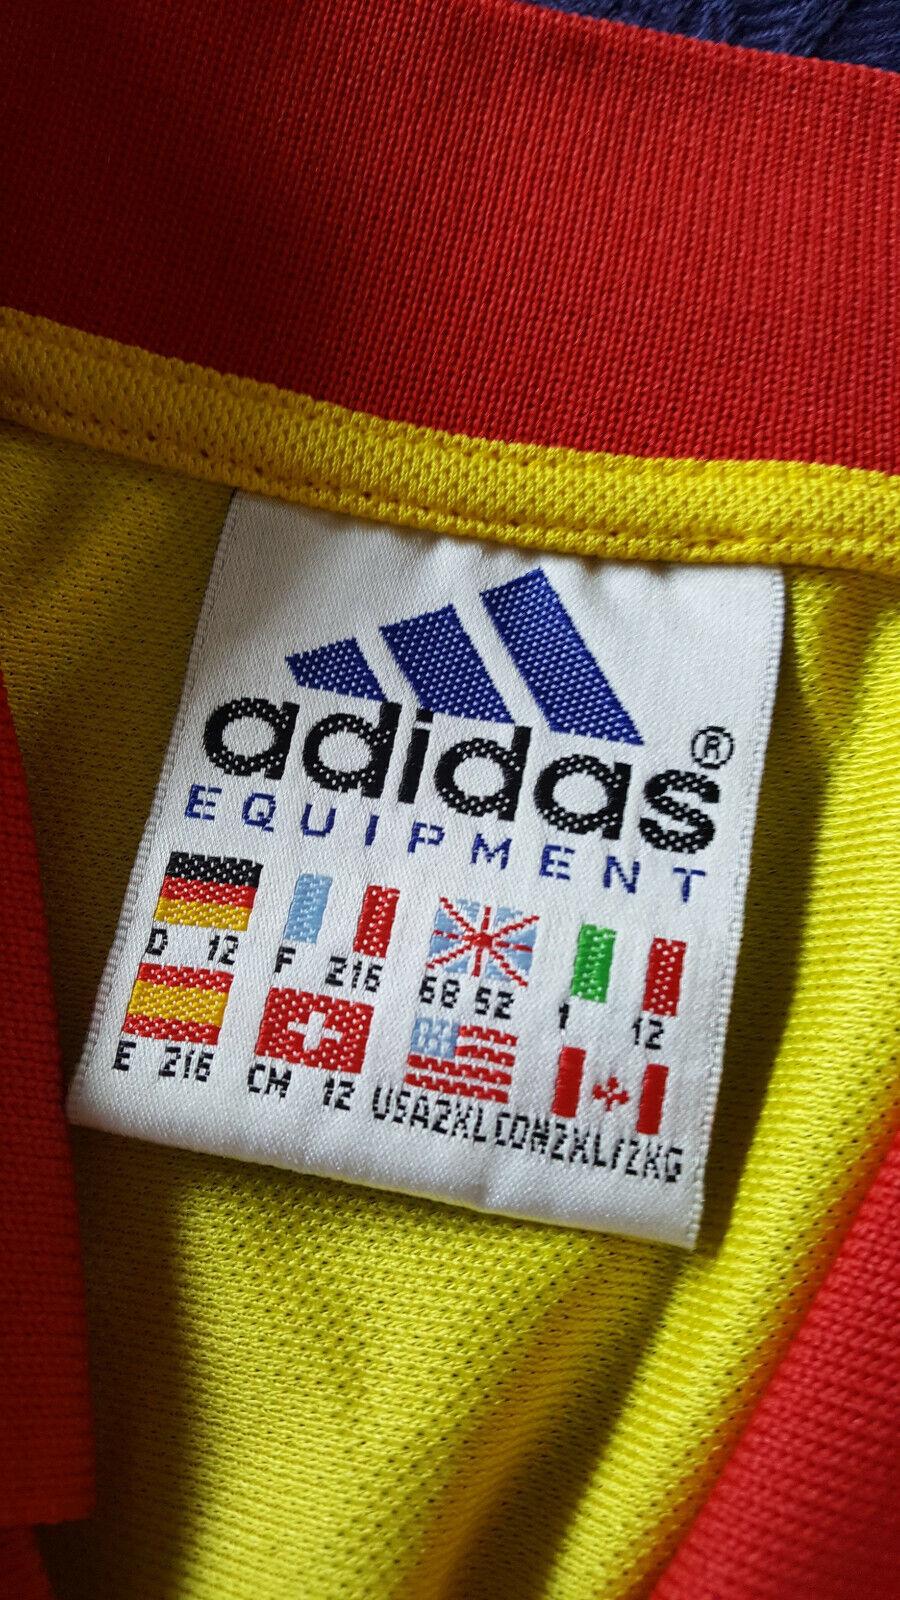 Maglia Roemannenië Hagi adidas EQUIPEMannenT player issue Uefa EURO 2000 shirtadidas